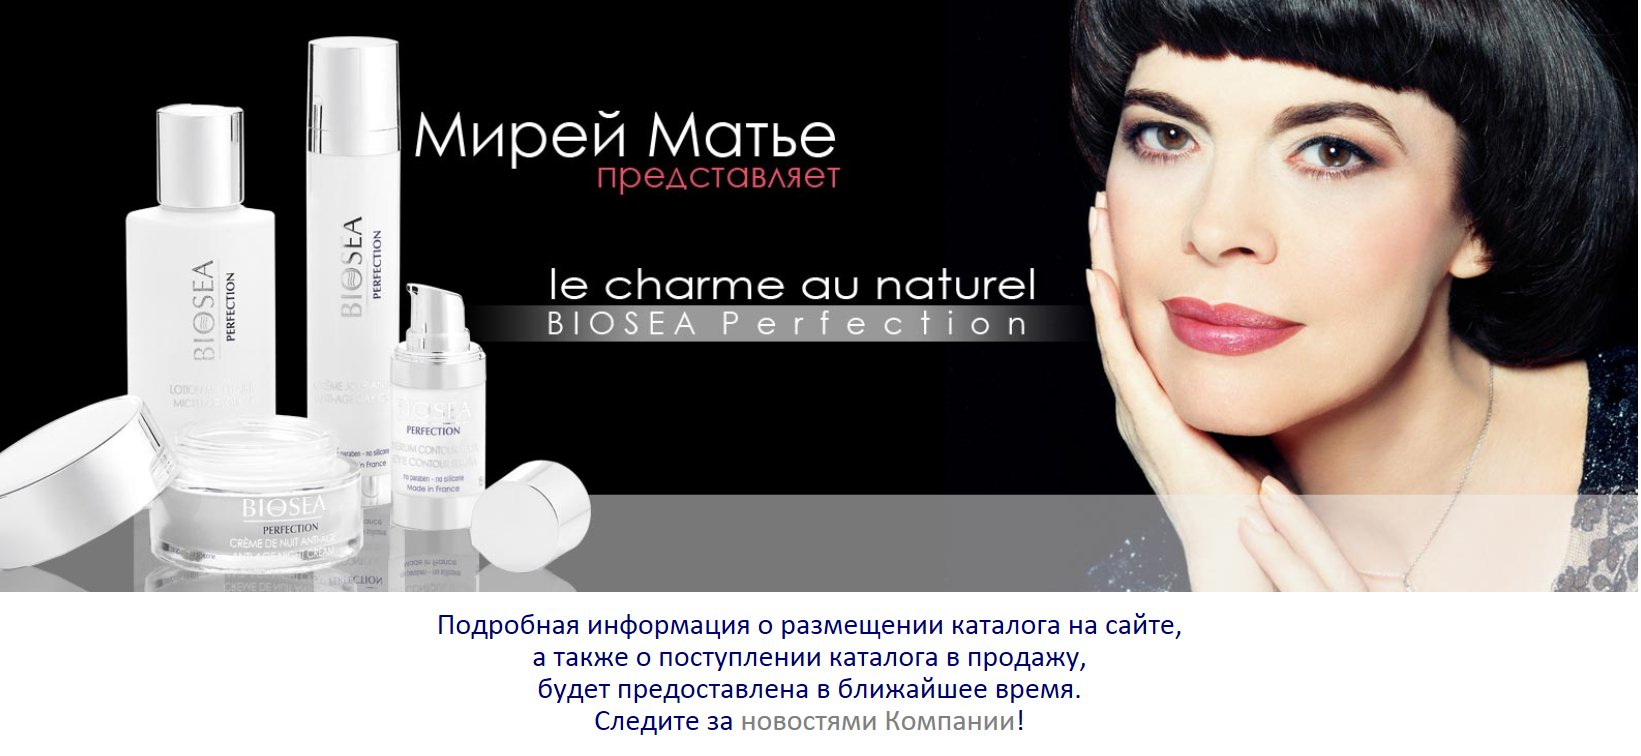 Mireille Mathieu - Rendezvous